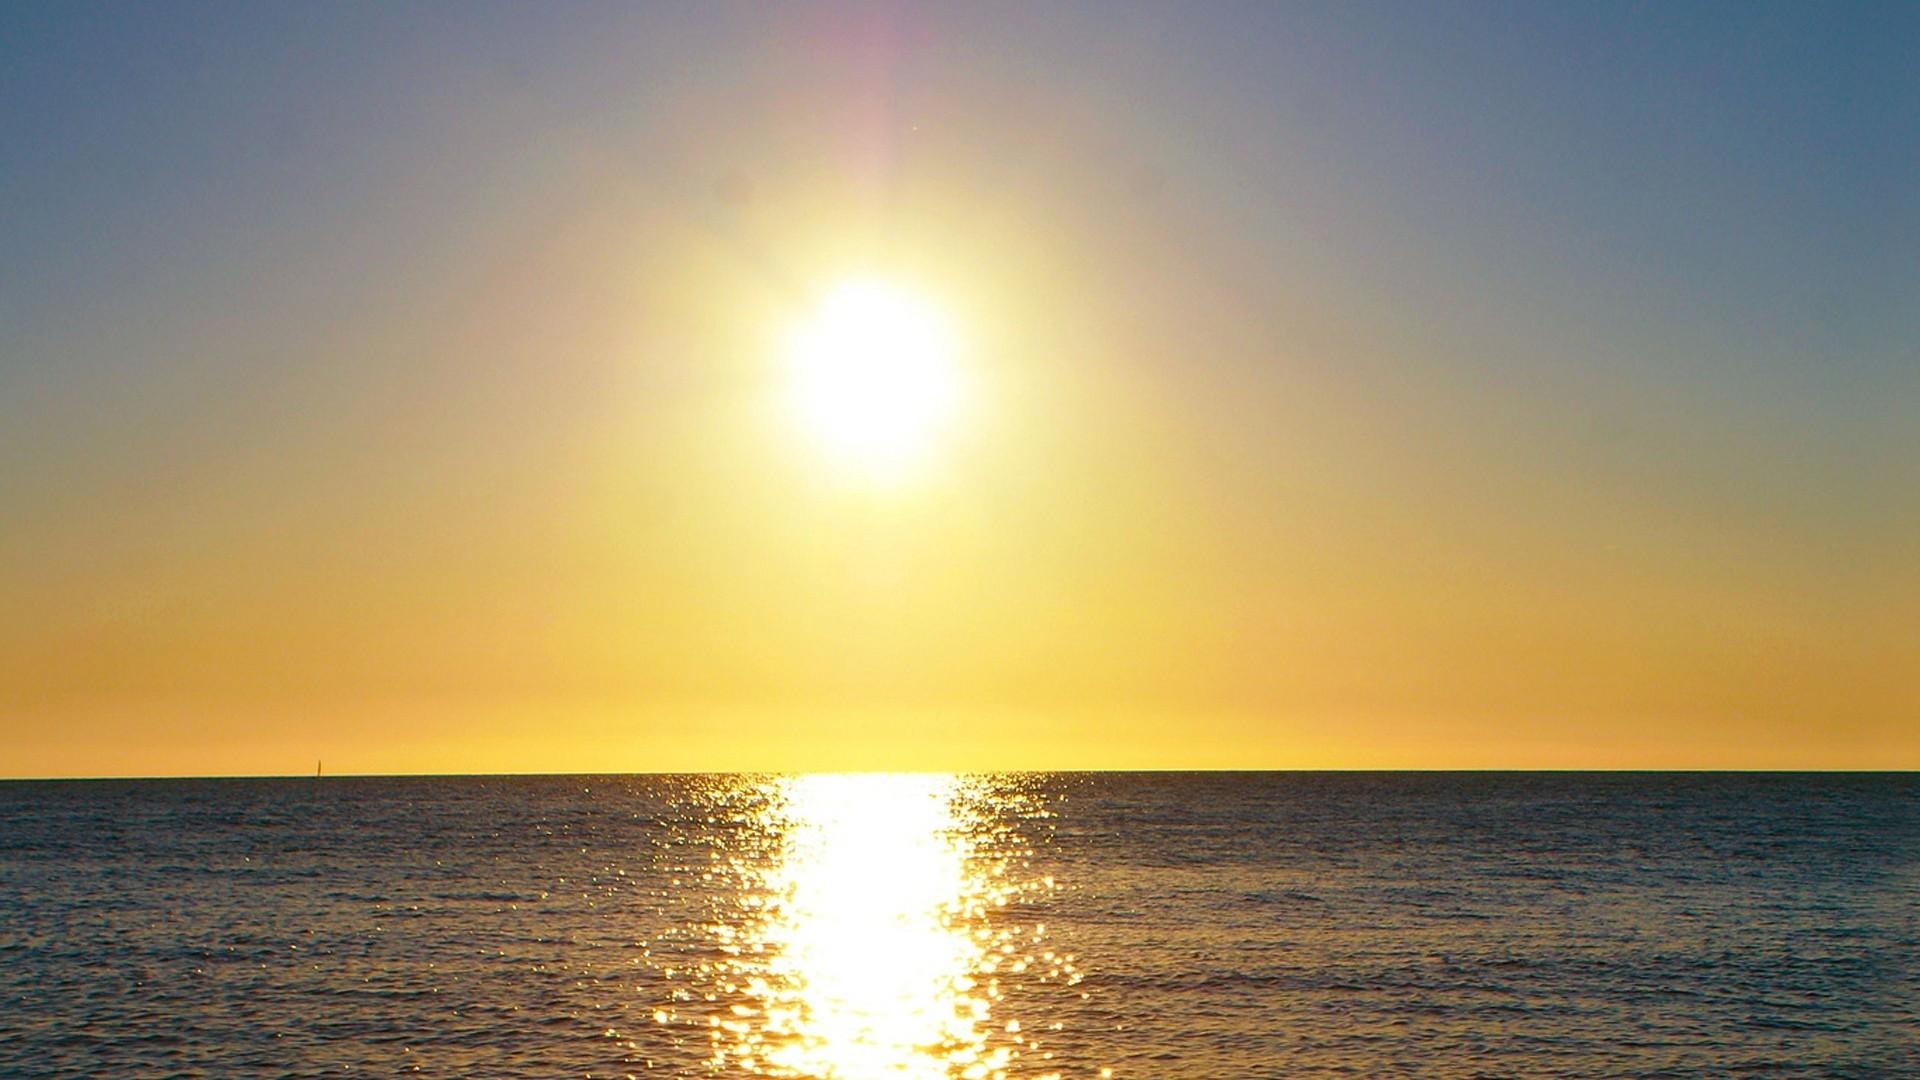 Sea Reflecting The Sunlight Wallpaper 1920x1080px